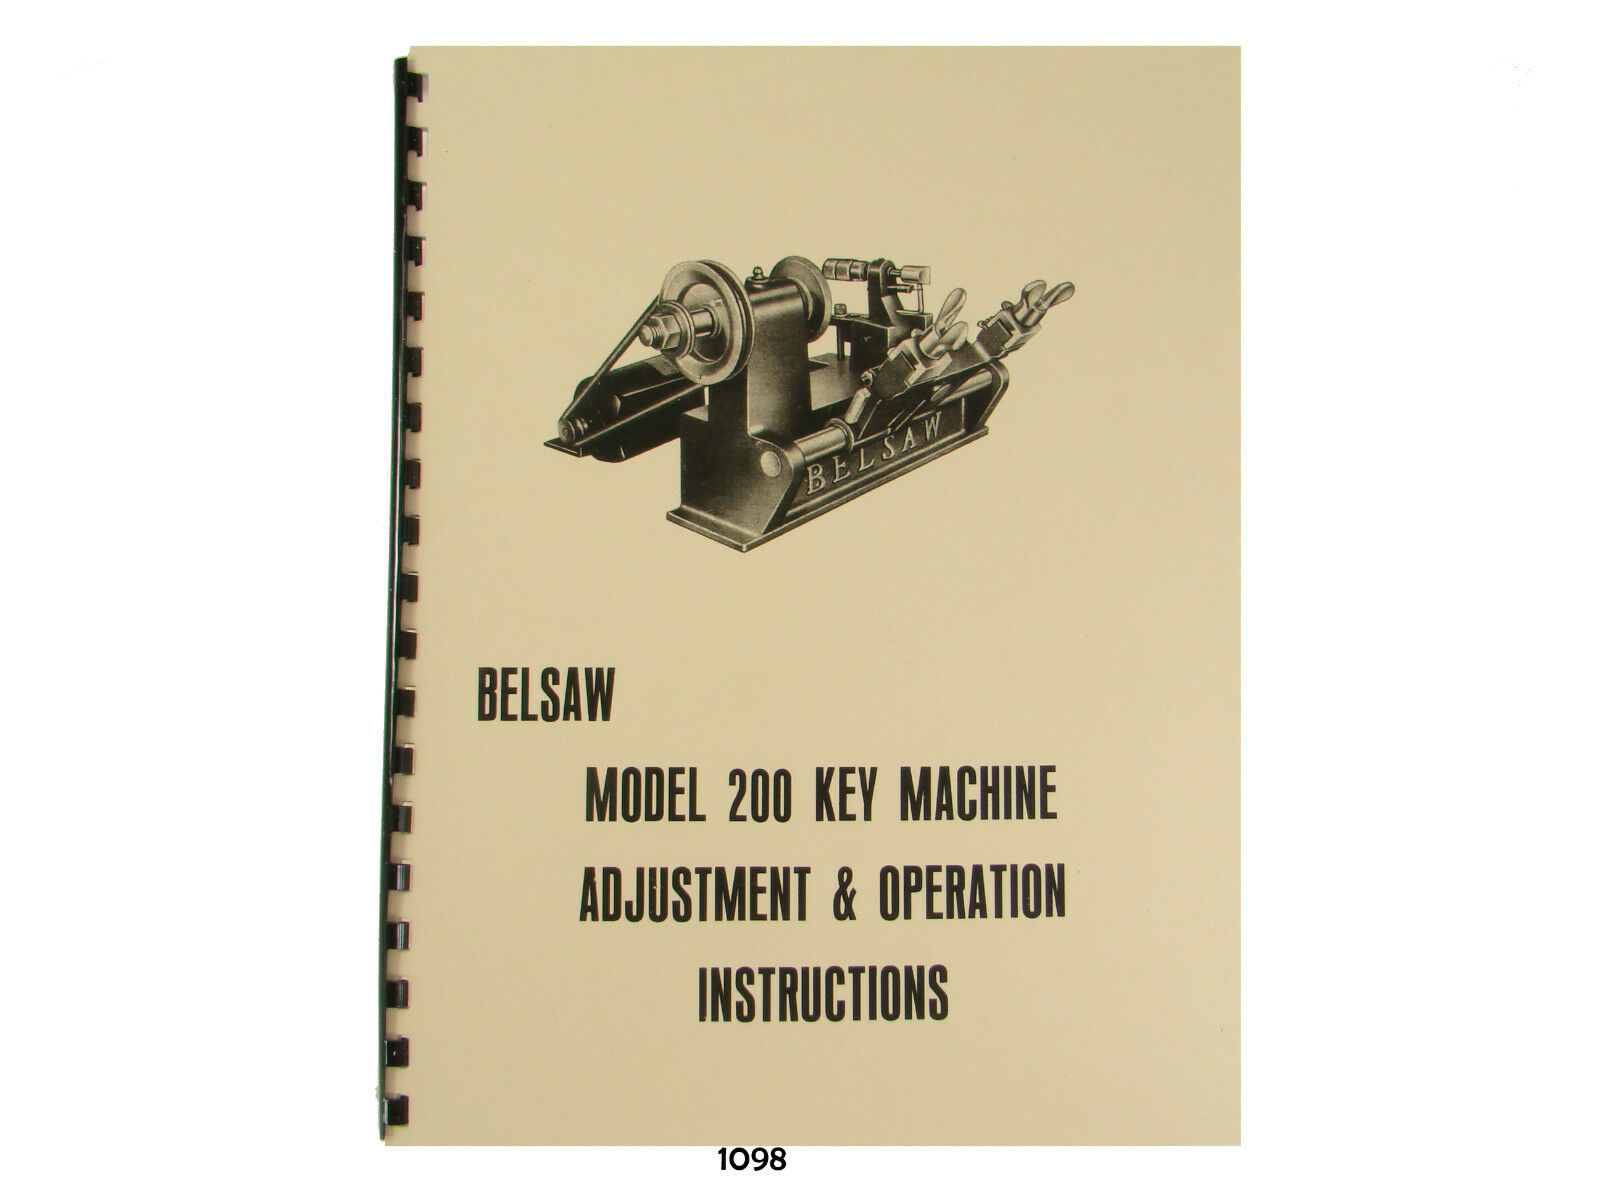 Foley Belsaw Model 200 Key Machine Adjustment and Operation Manual #1098